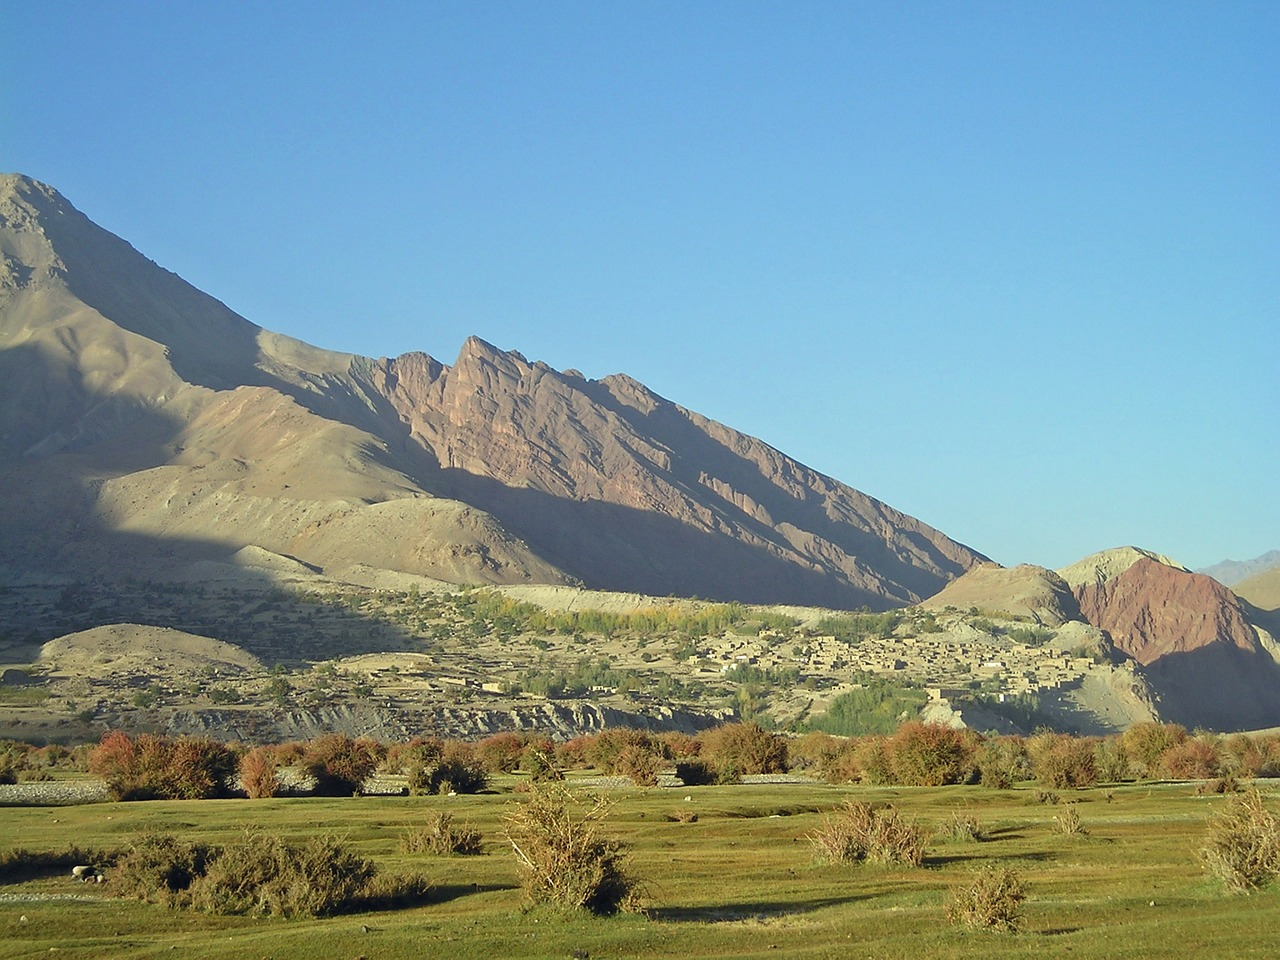 Afghanistan Mountains Landscape - Free photo on Pixabay